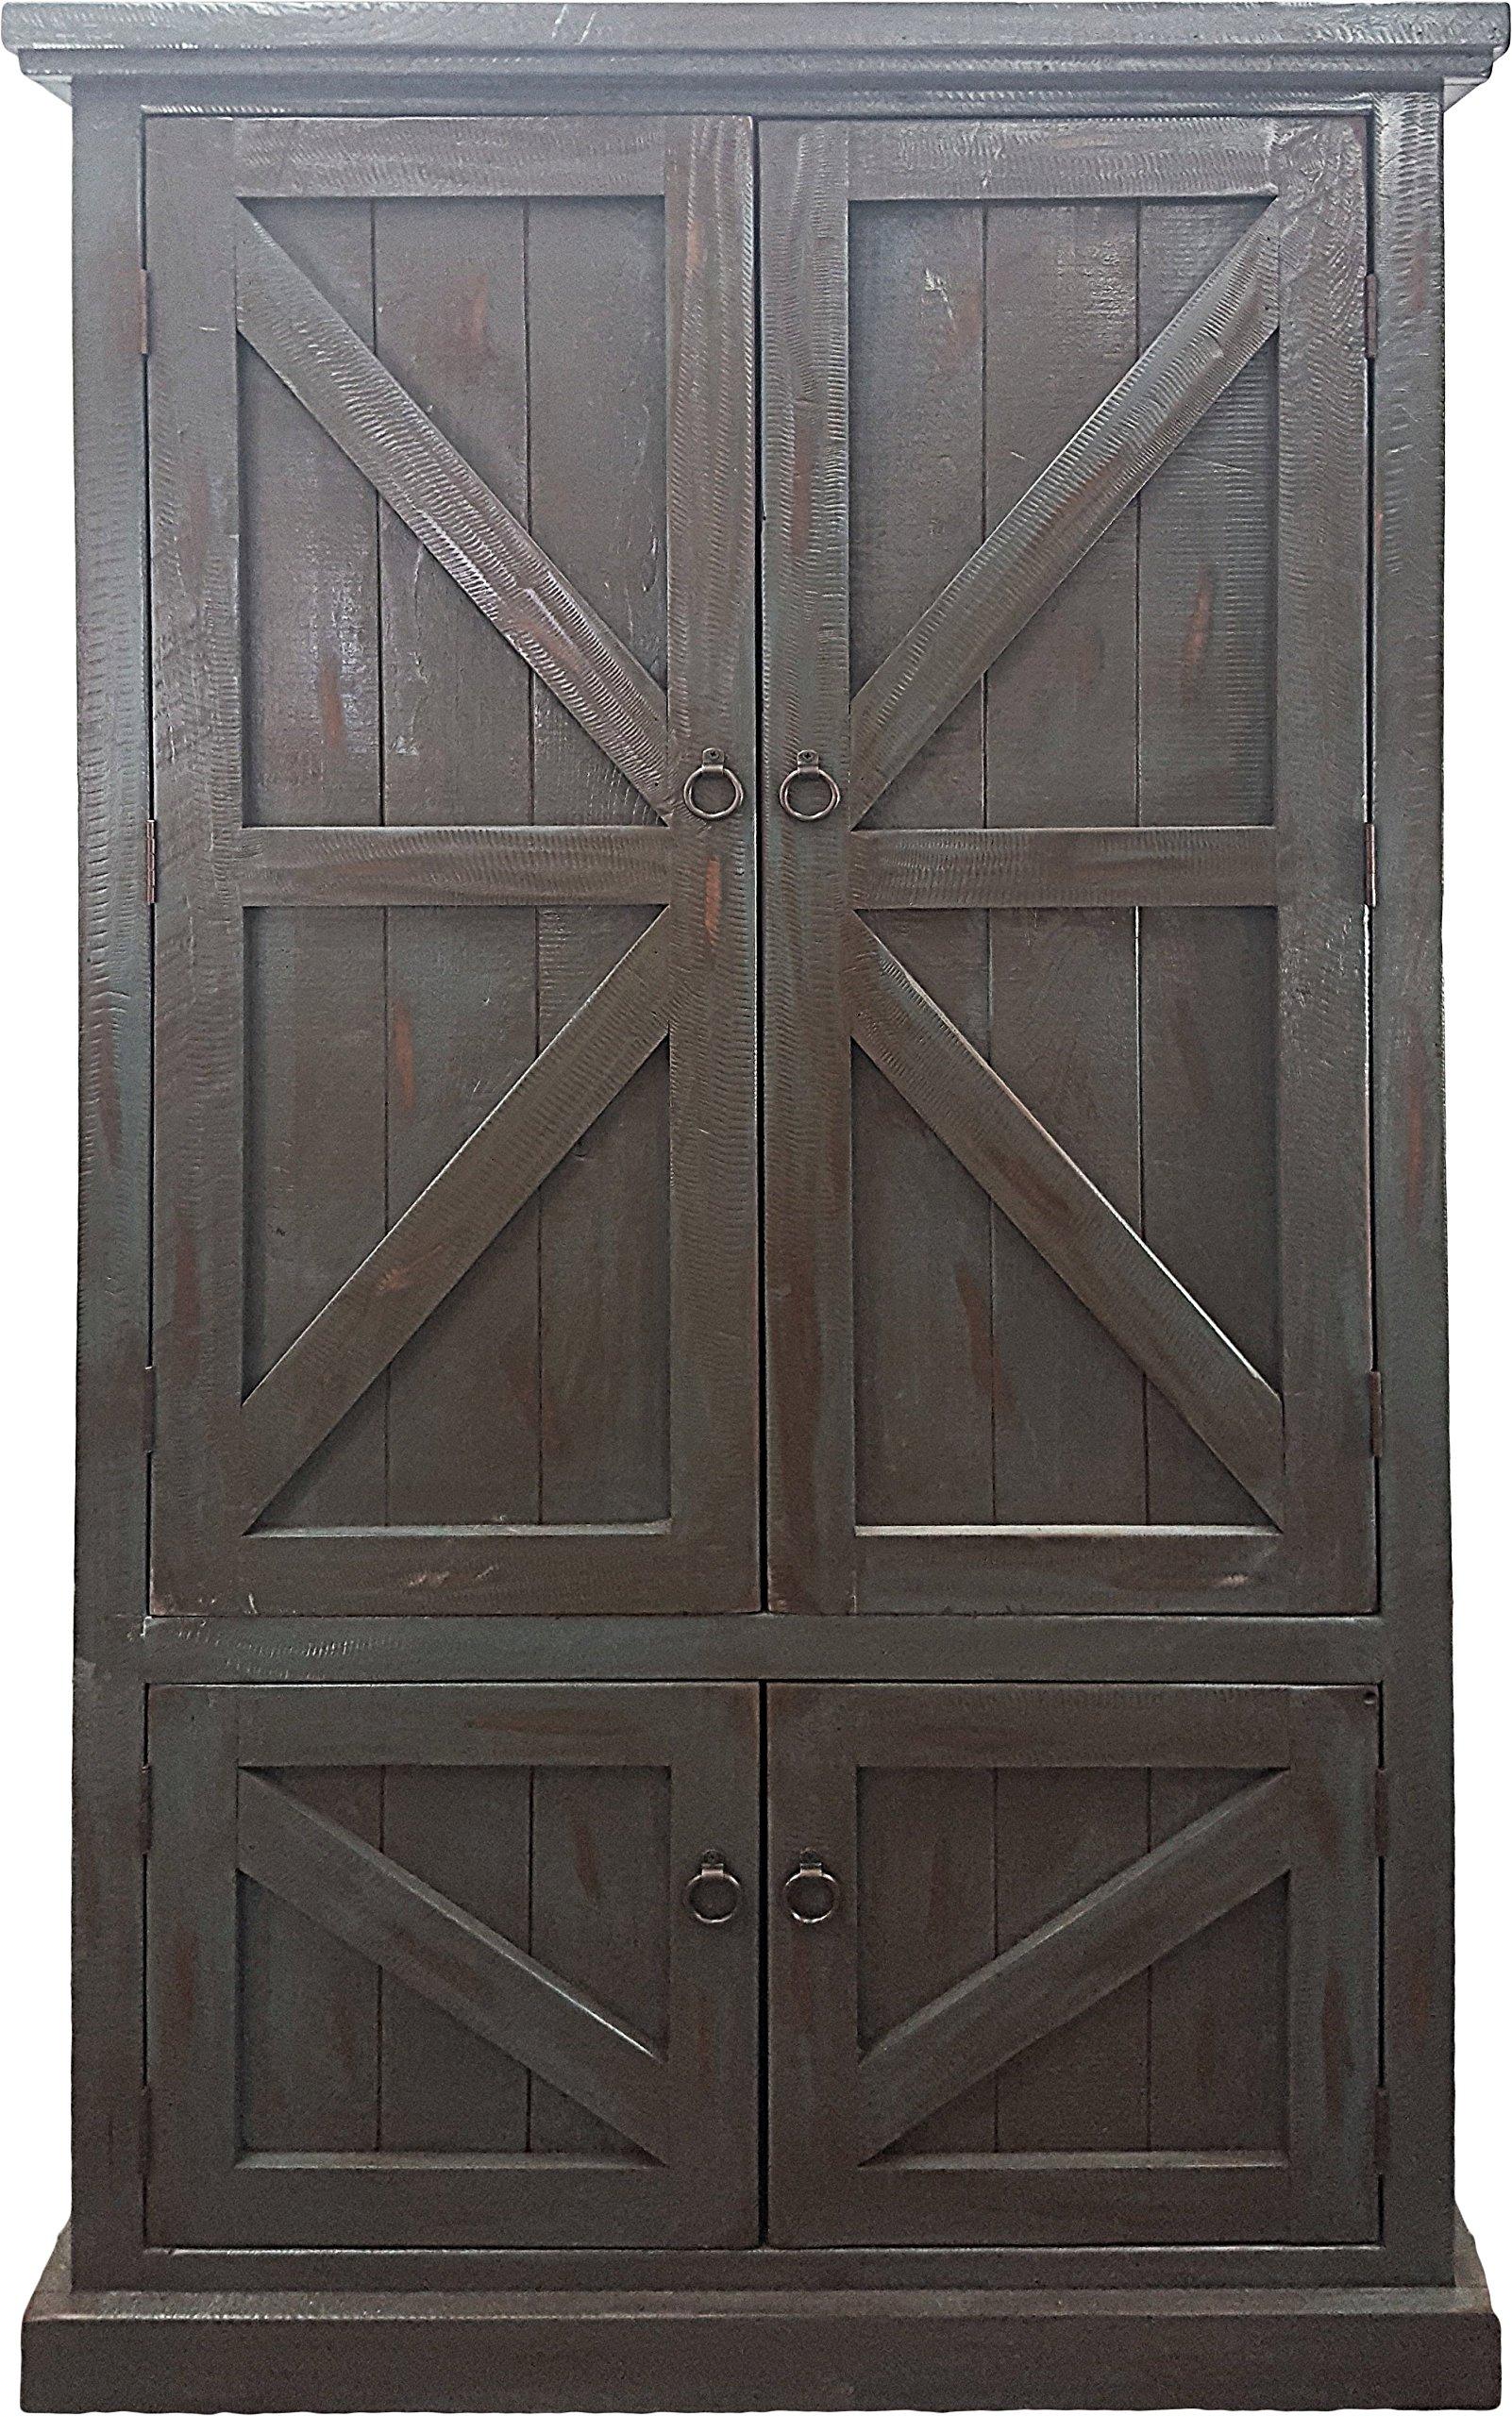 American Heartland #30791RGY Rustic Double Door Pantry, Rustic Grey